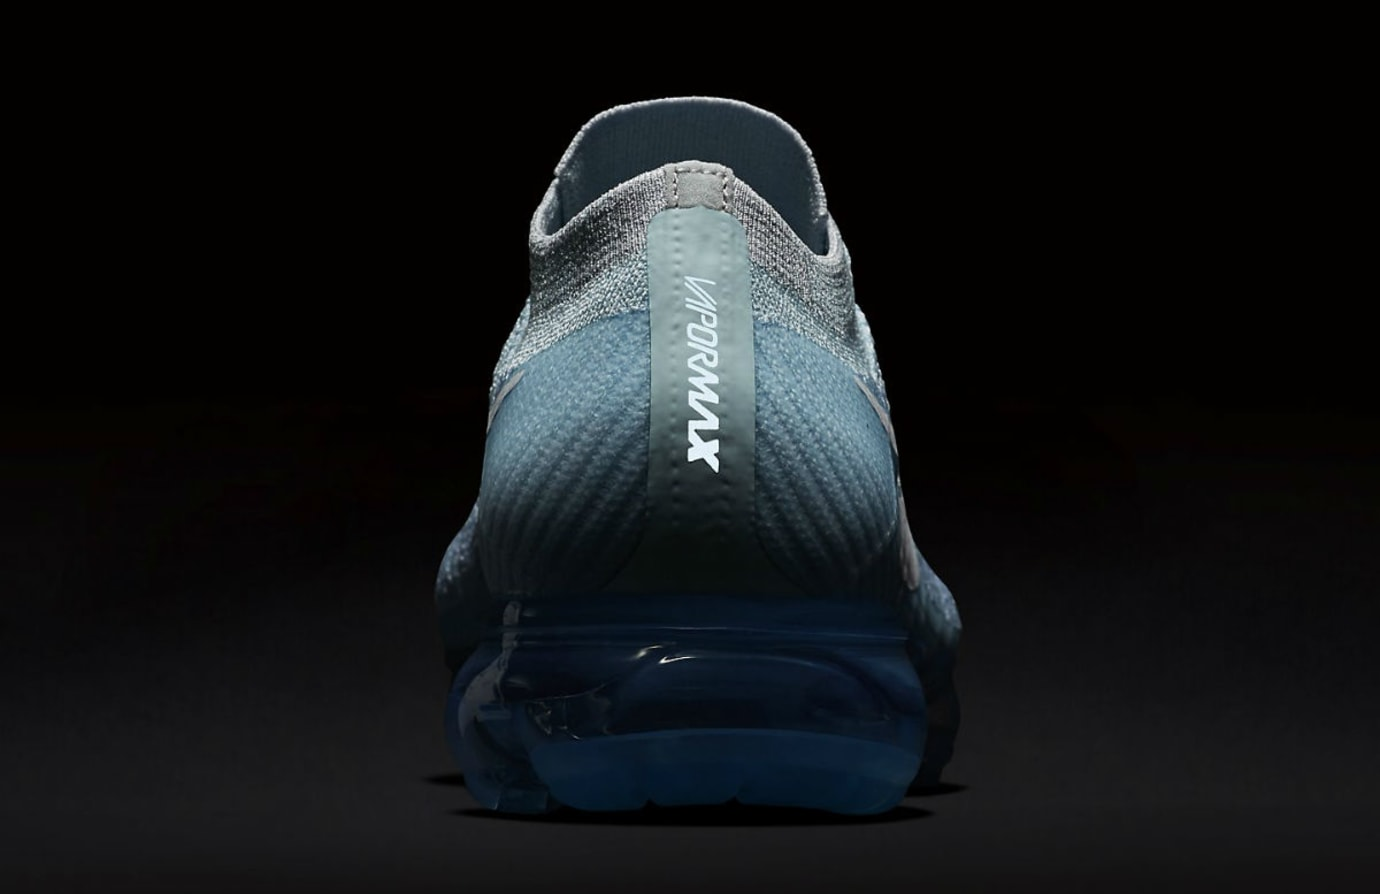 7f6f781e68cd9 Nike Air VaporMax Glacier Blue Release Date 3M 849558-404